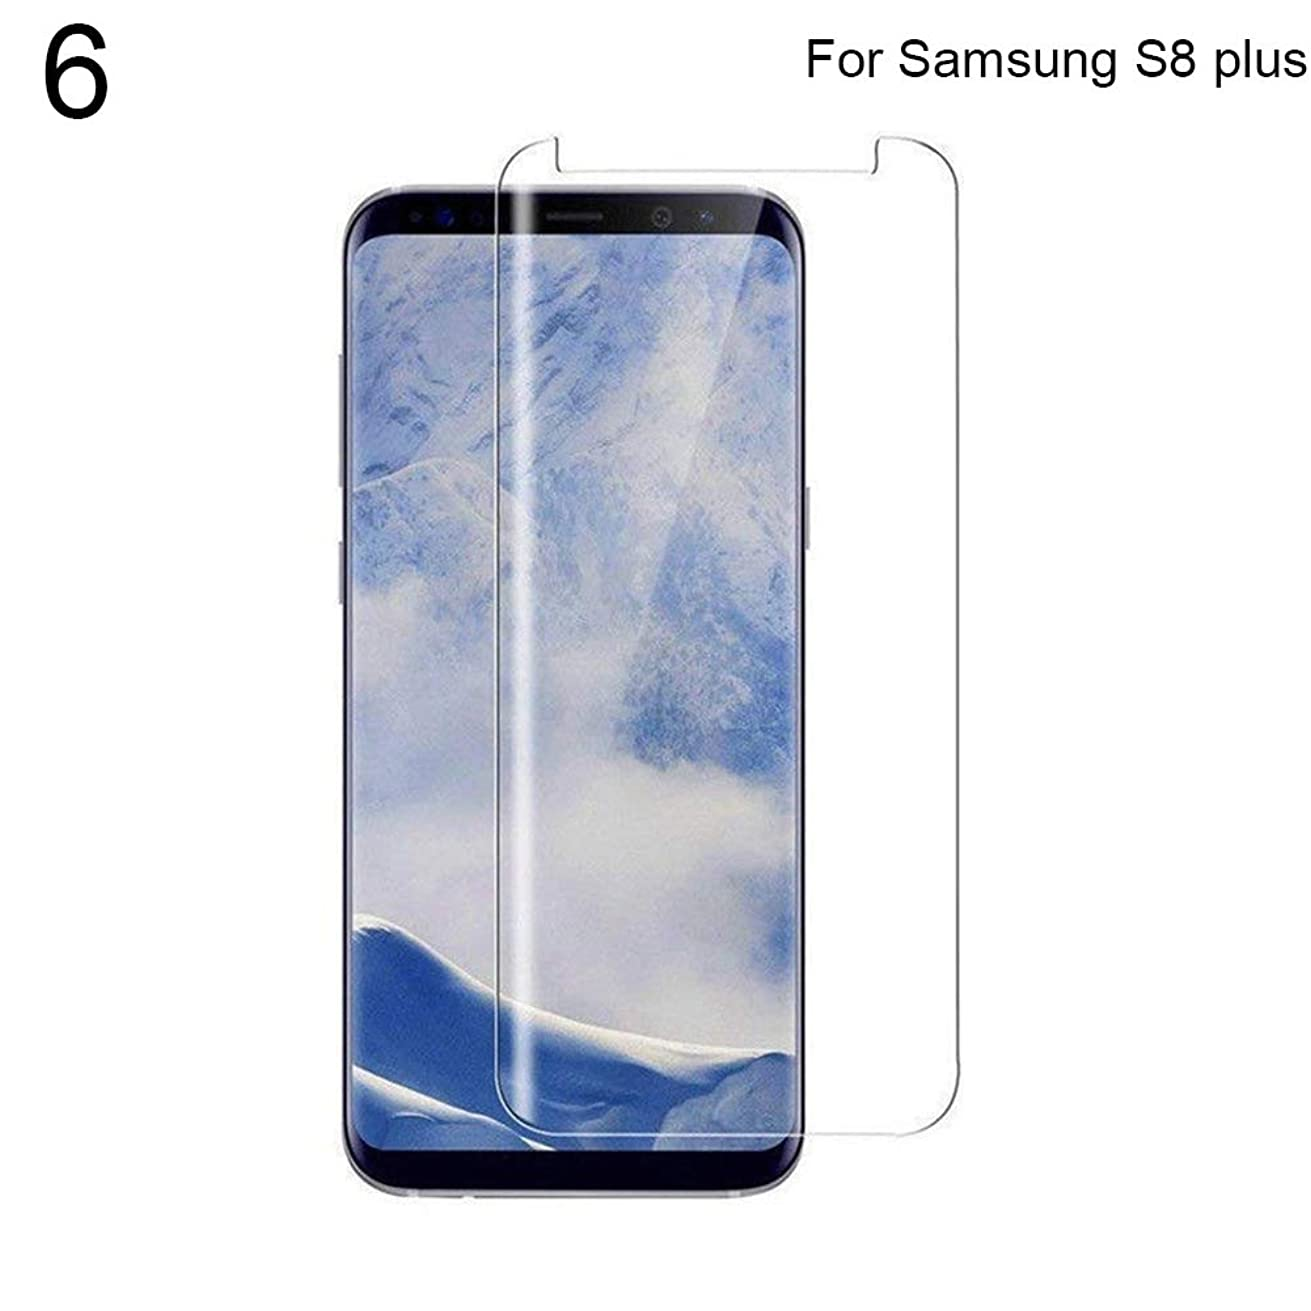 Gyswshh Tempered Glass, Screen Protector ,Nano UV Liquid Glue for Samsung Galaxy S9 S8 Transparent for Samsung Note 8